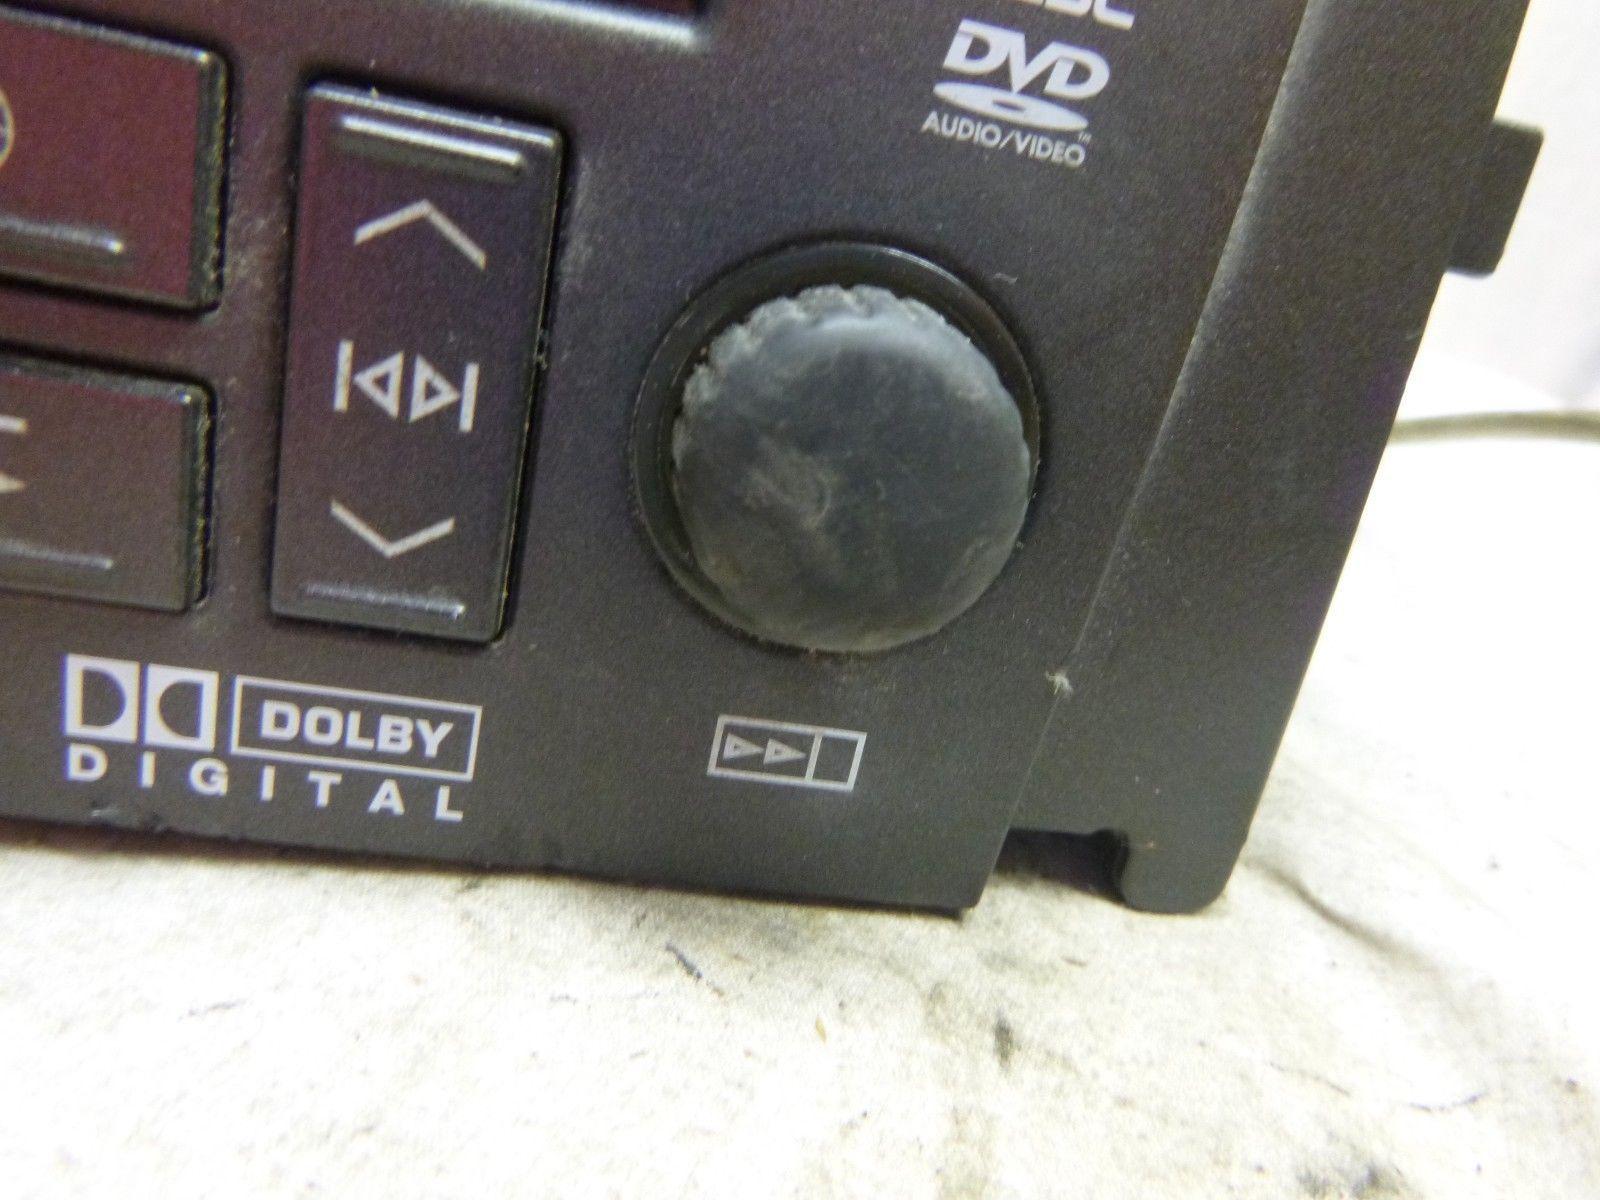 08 Cadillac STS DVD 6 Disc CD Navigation Radio Display Radio OEM 15904398 FP18